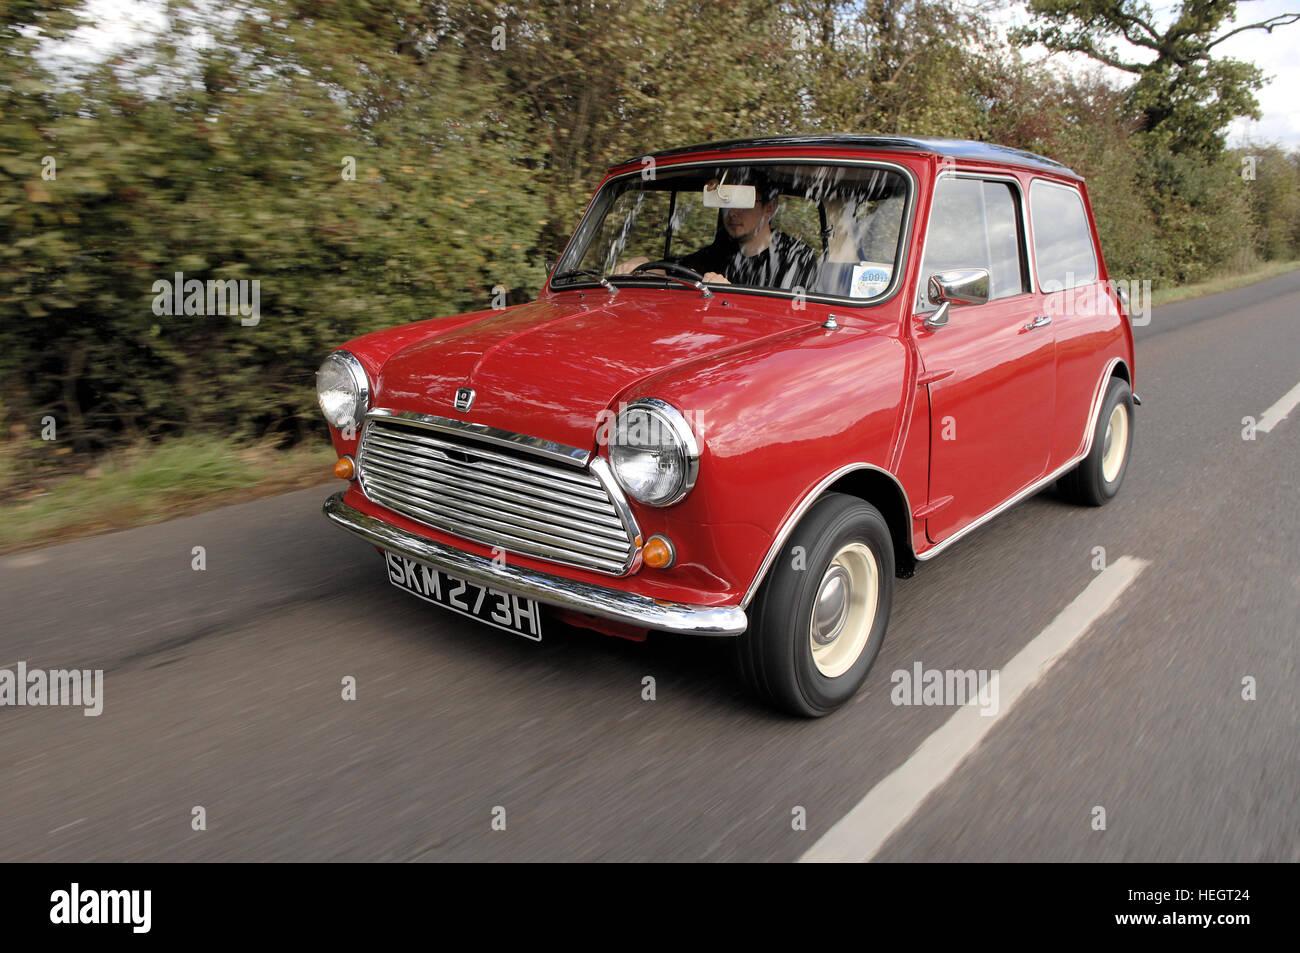 Red Morris Mini Cooper action shot - Stock Image